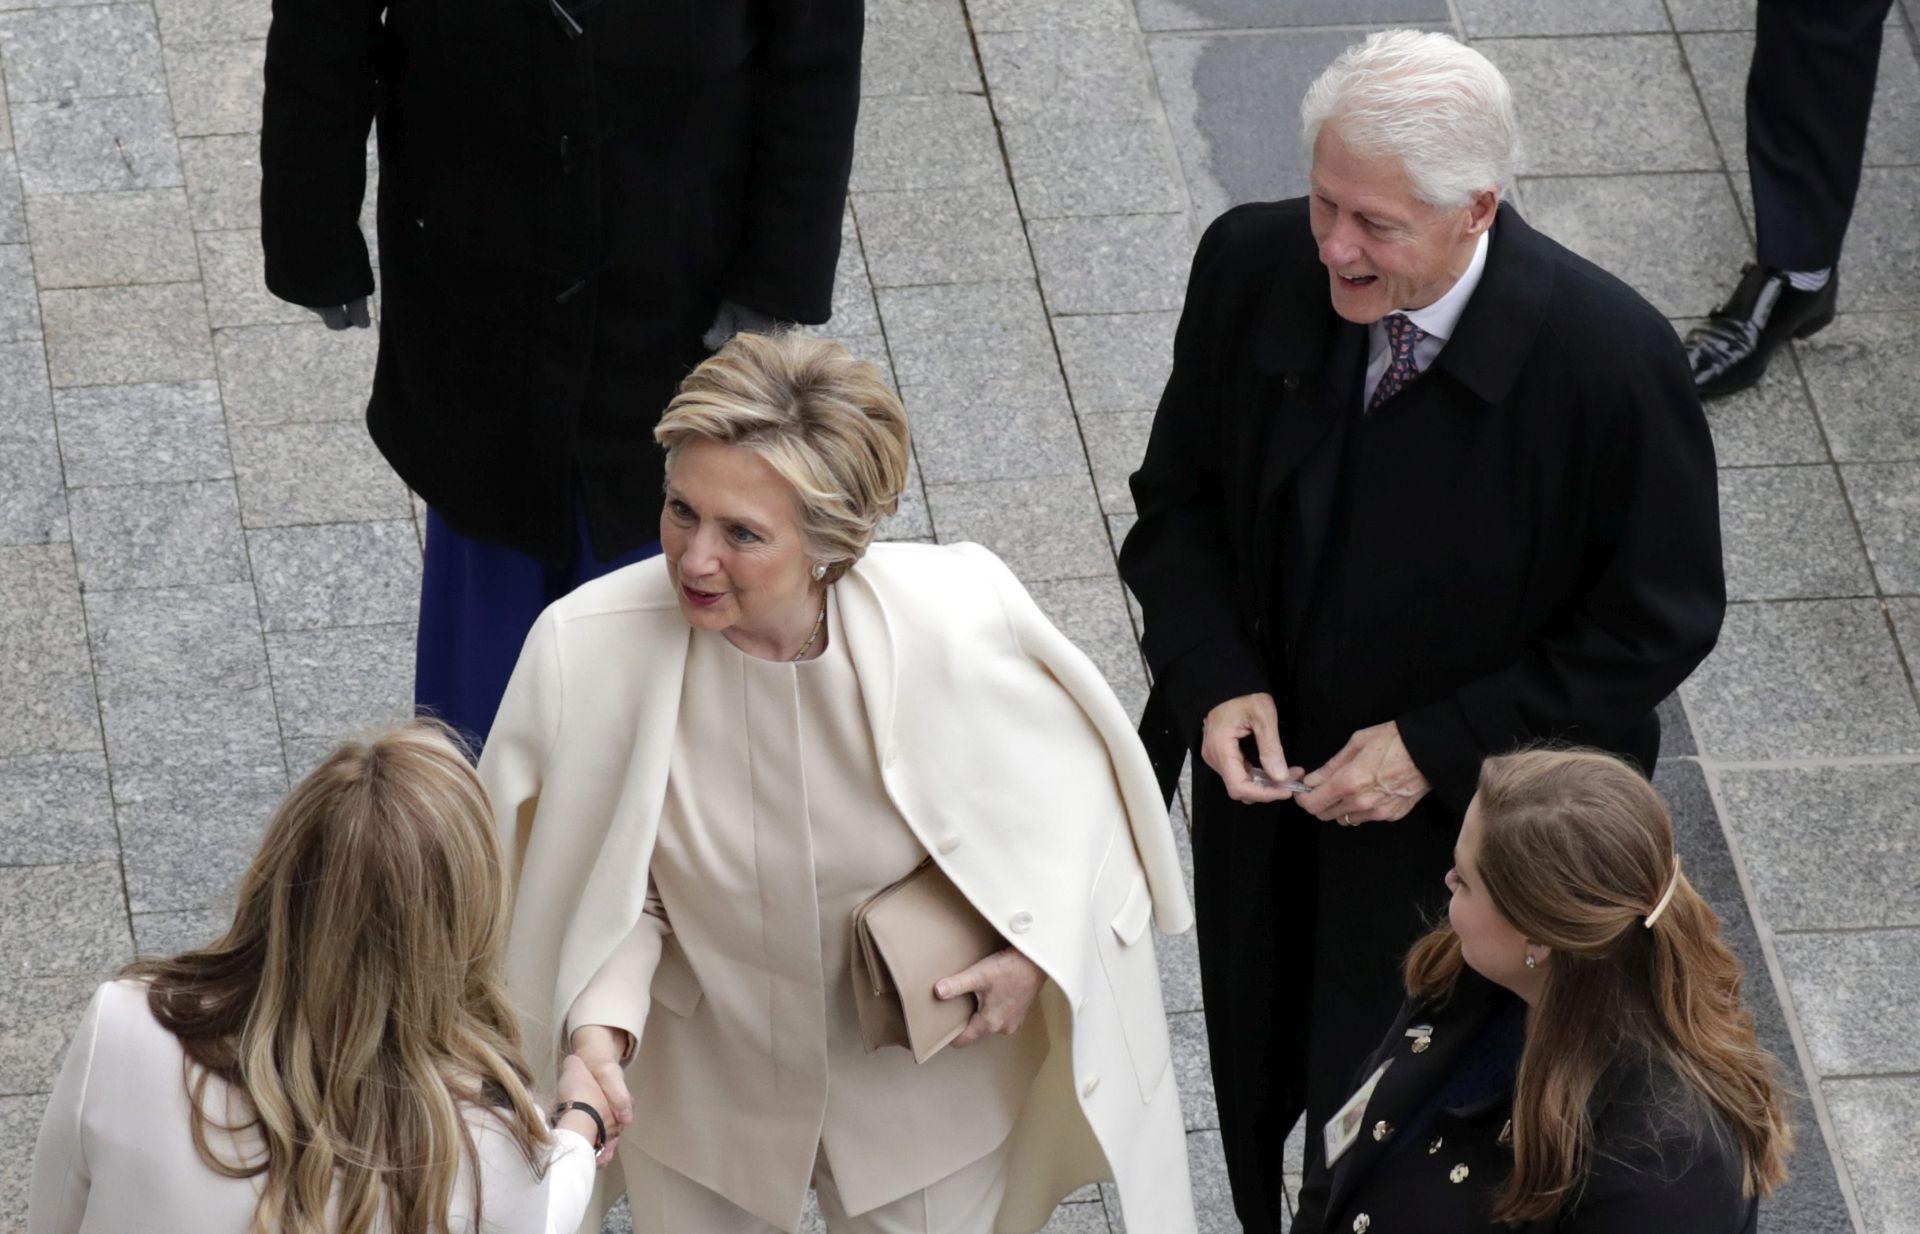 Trump odao priznanje Hillary Clinton pred kongresnicima